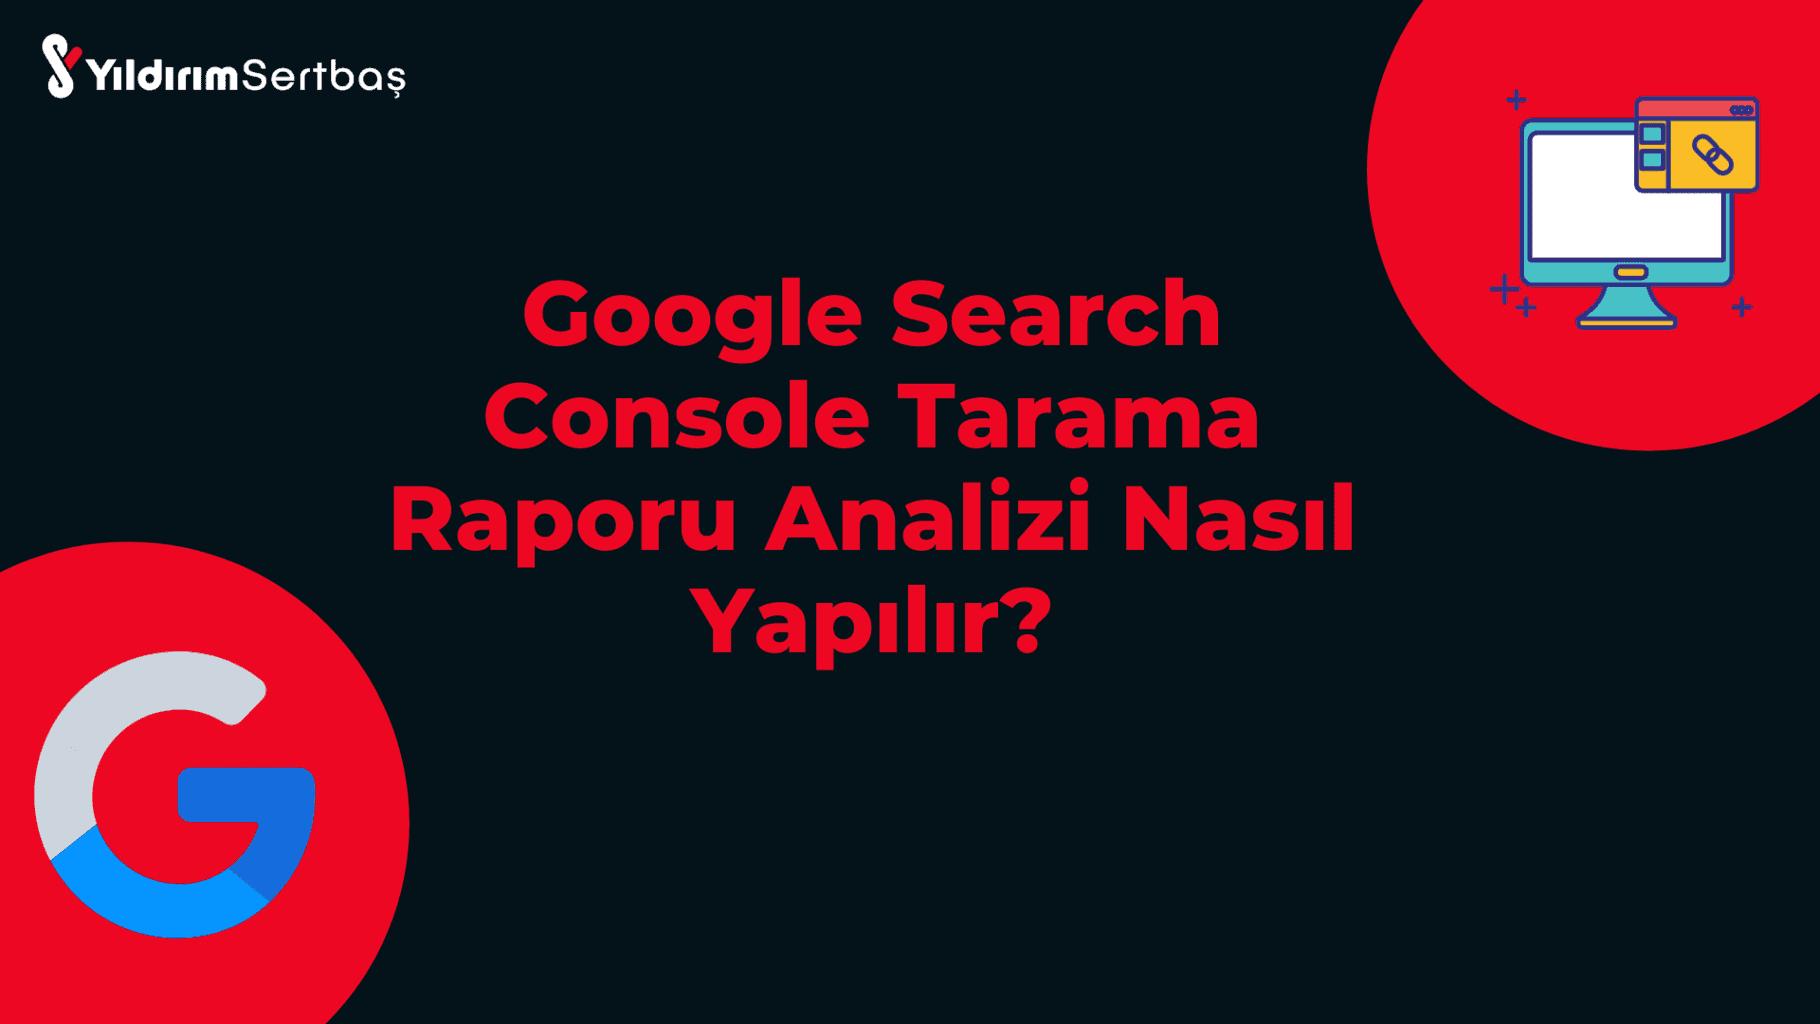 google search console tarama raporu - tarama istatistikleri raporu